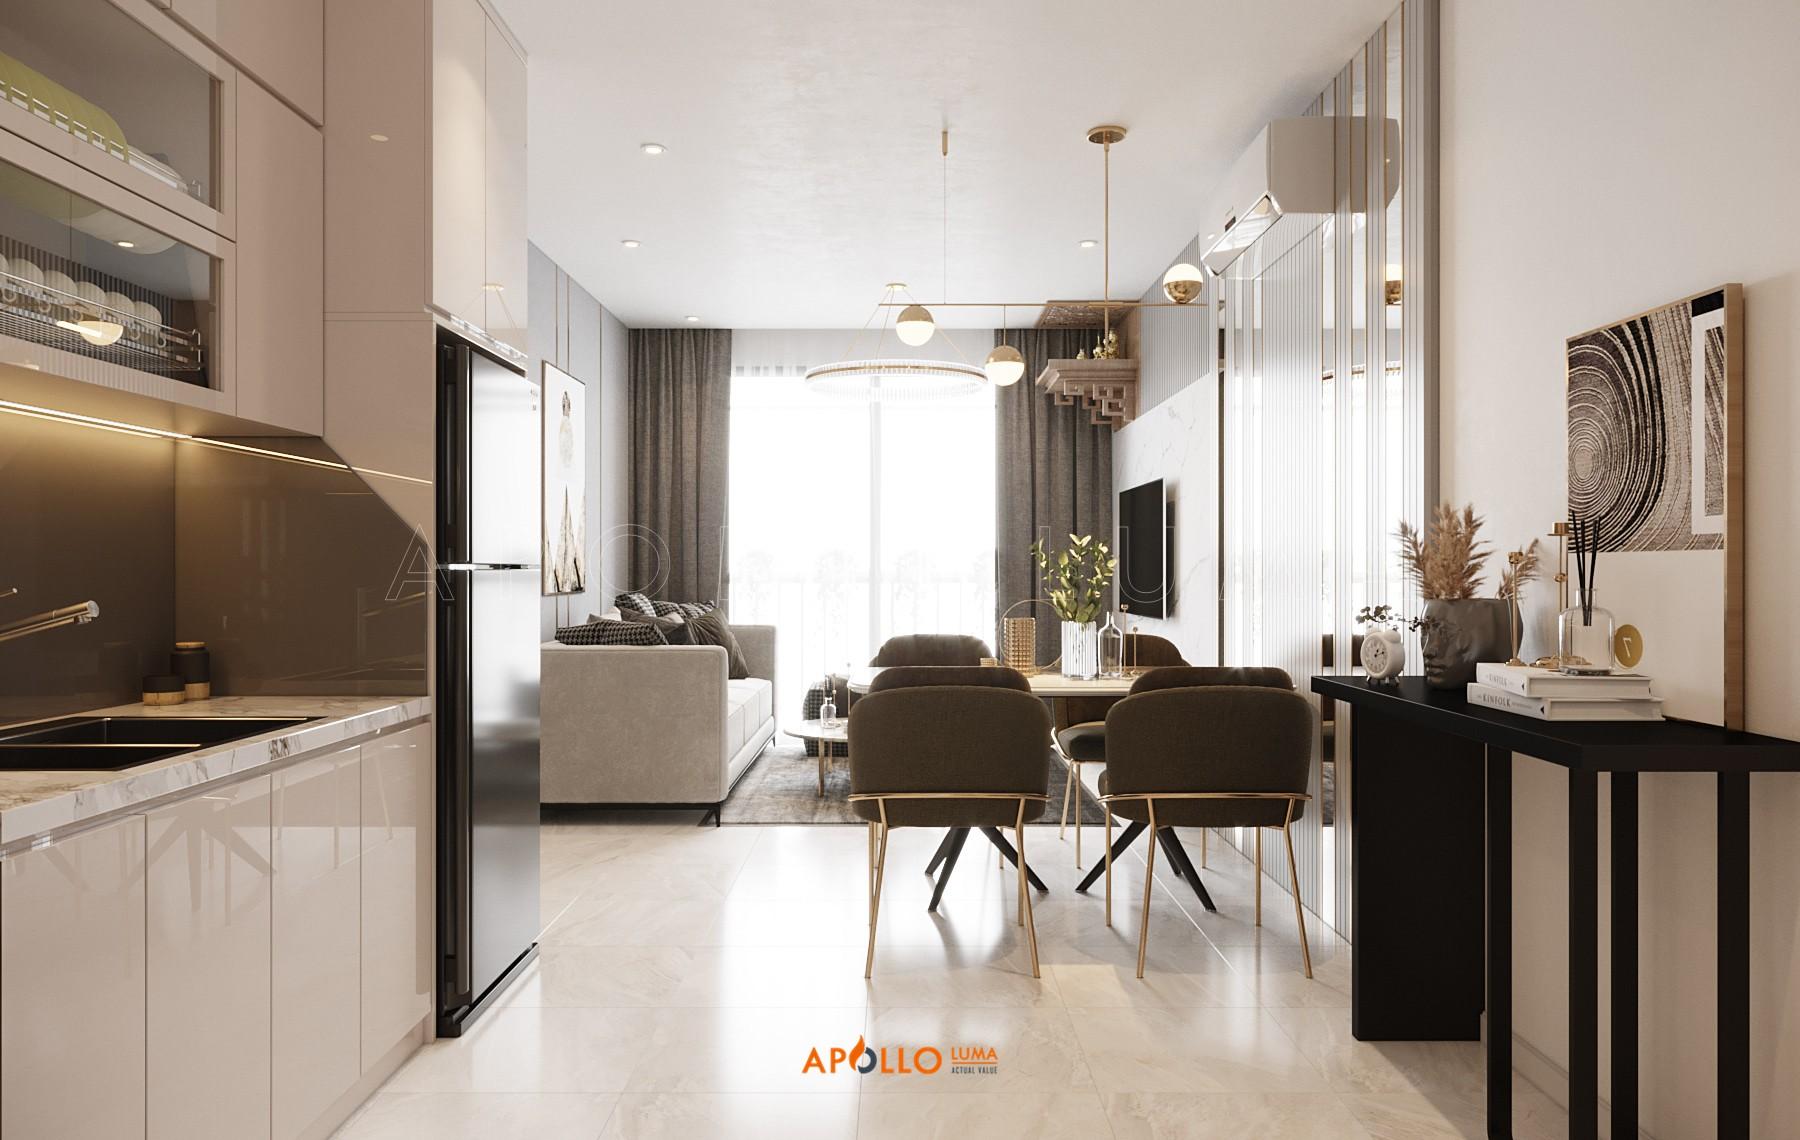 Thiết kế nội thất căn 55m2 (2PN+1) S1.11-8A Vinhomes Ocean Park